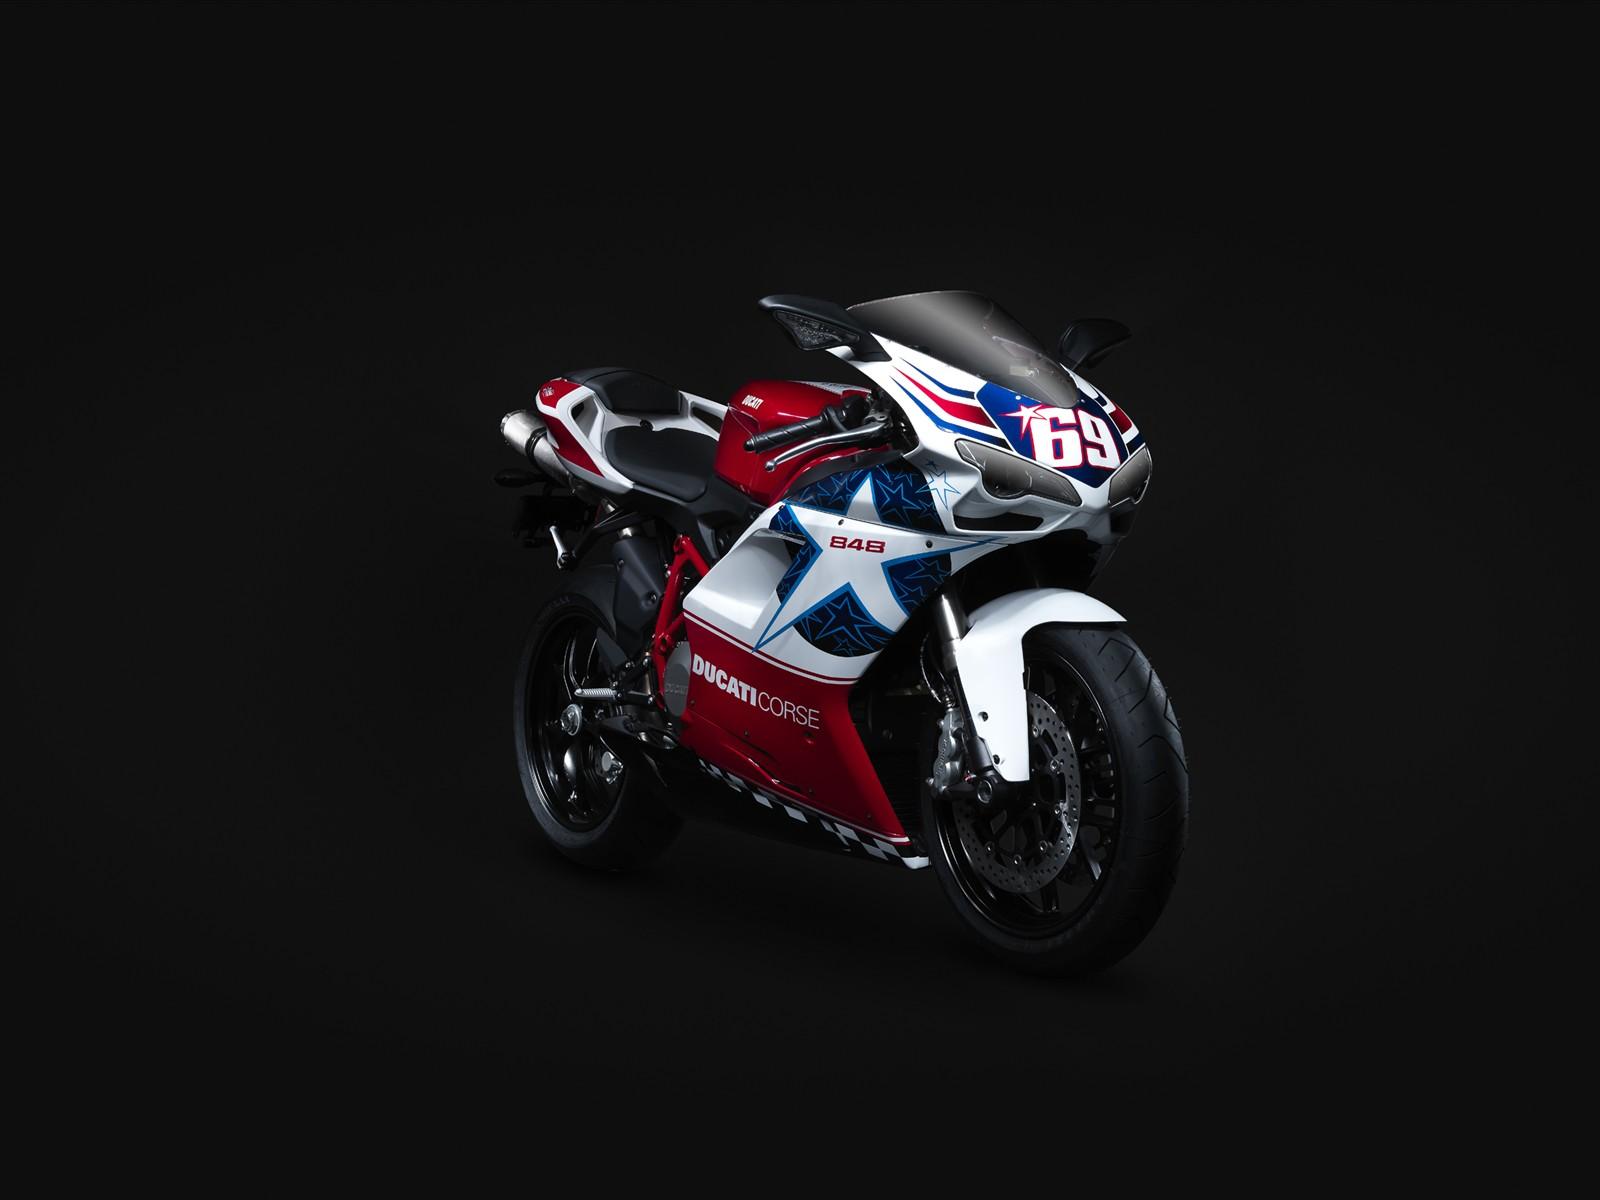 Ducati 848 Wallpapers HD Wallpapers 1600x1200